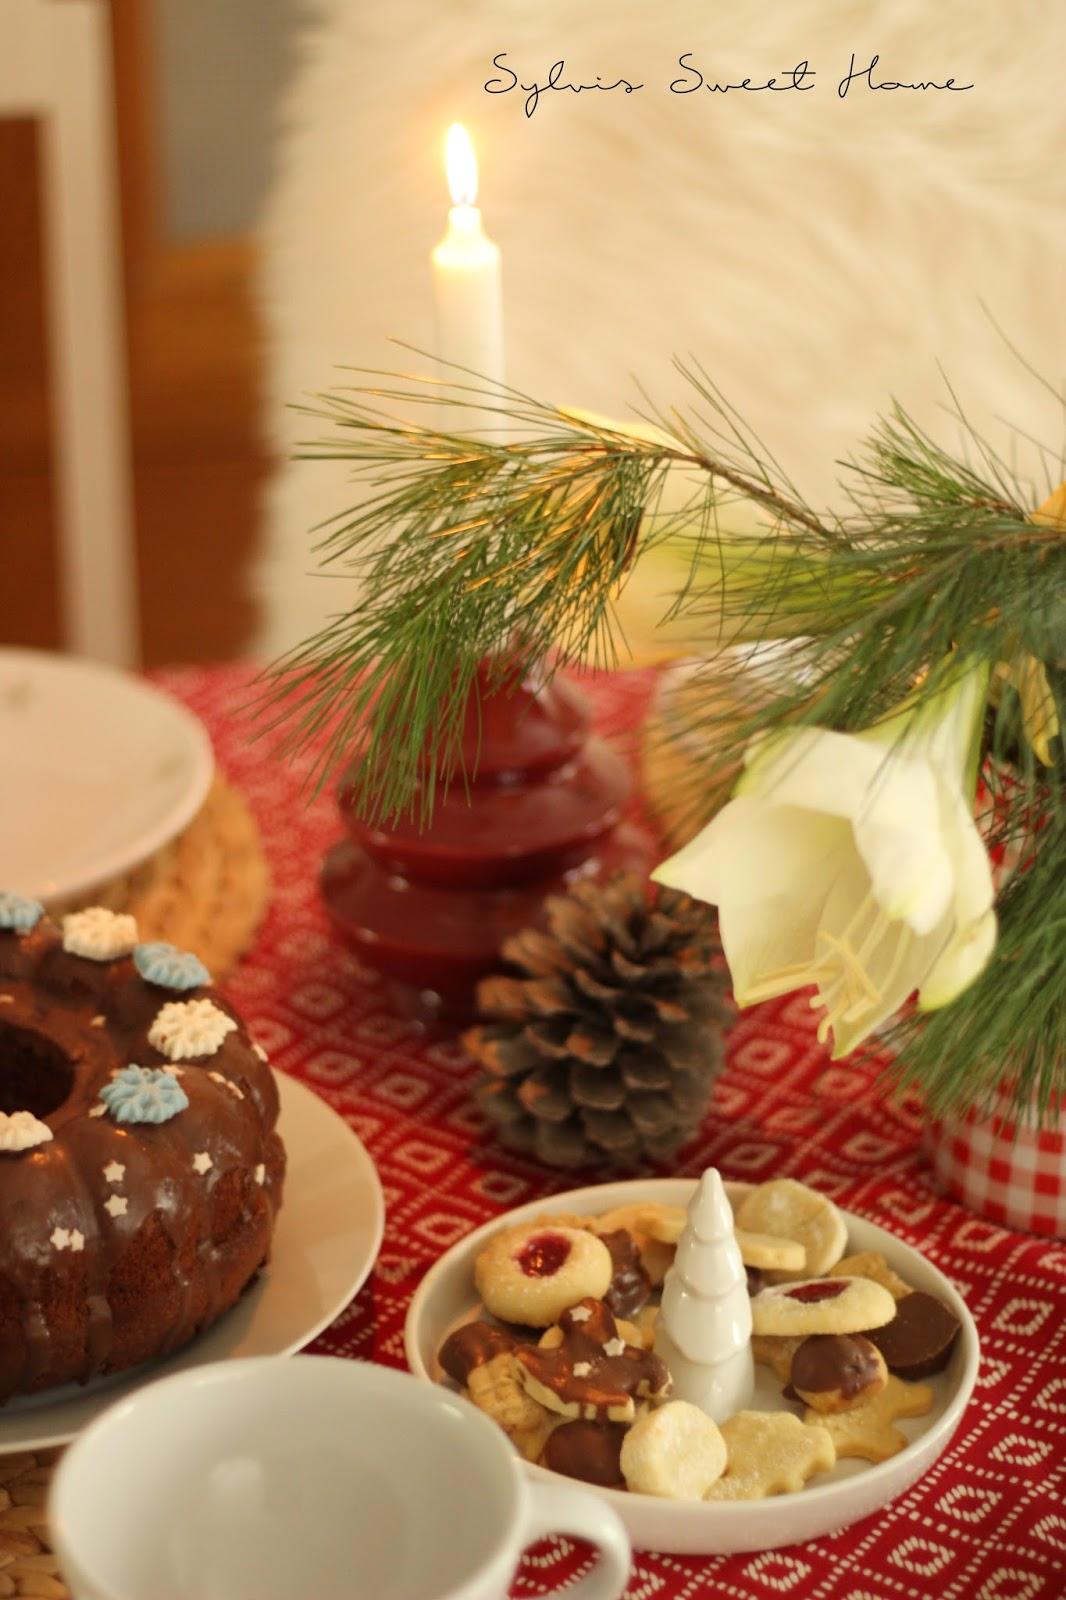 Weihnachtsbilder Nikolaus.Sylvis Sweet Home An Nikolaus